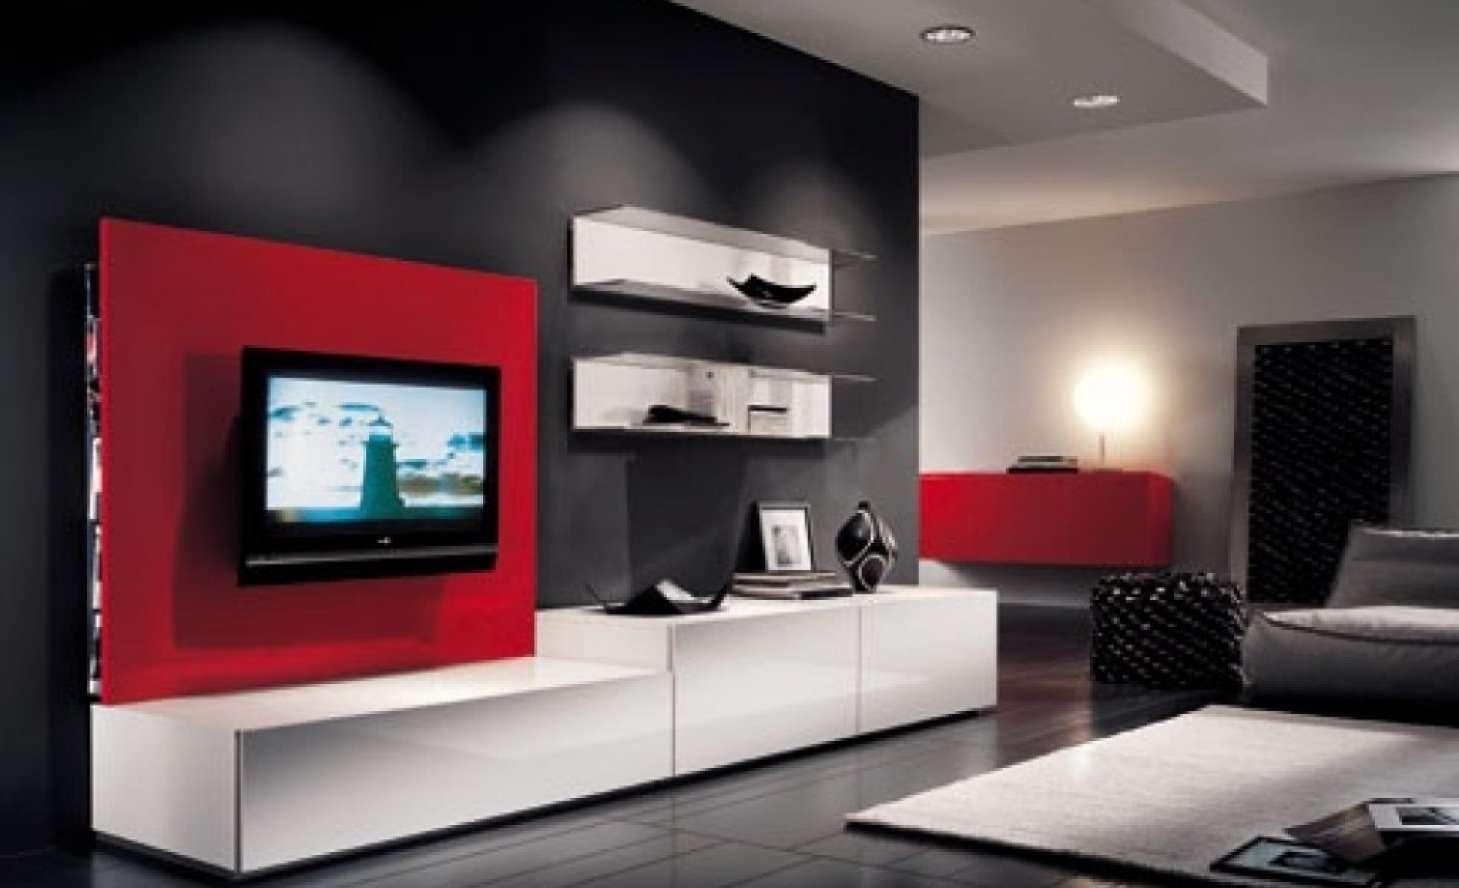 Cabinet : Ultra Modern Tv Stands Amazing Media Center Cabinet For Ultra Modern Tv Stands (View 6 of 15)